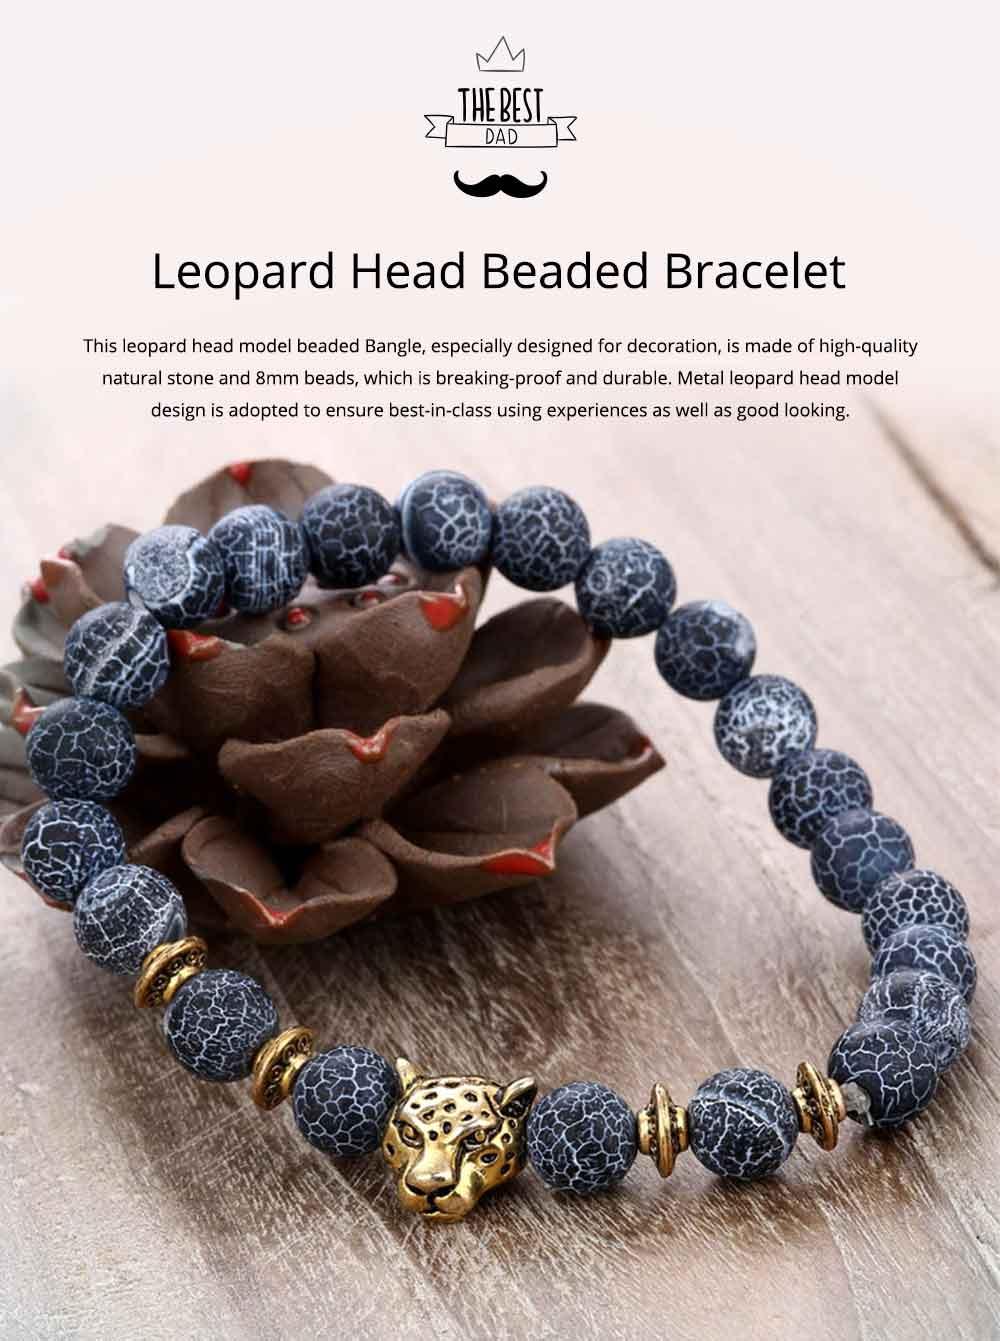 Stylish Elastic Beaded Bracelet Bangle for Men Women, Aggressive Natural Stone 8mm Beads Leopard Head Hand Chain 0